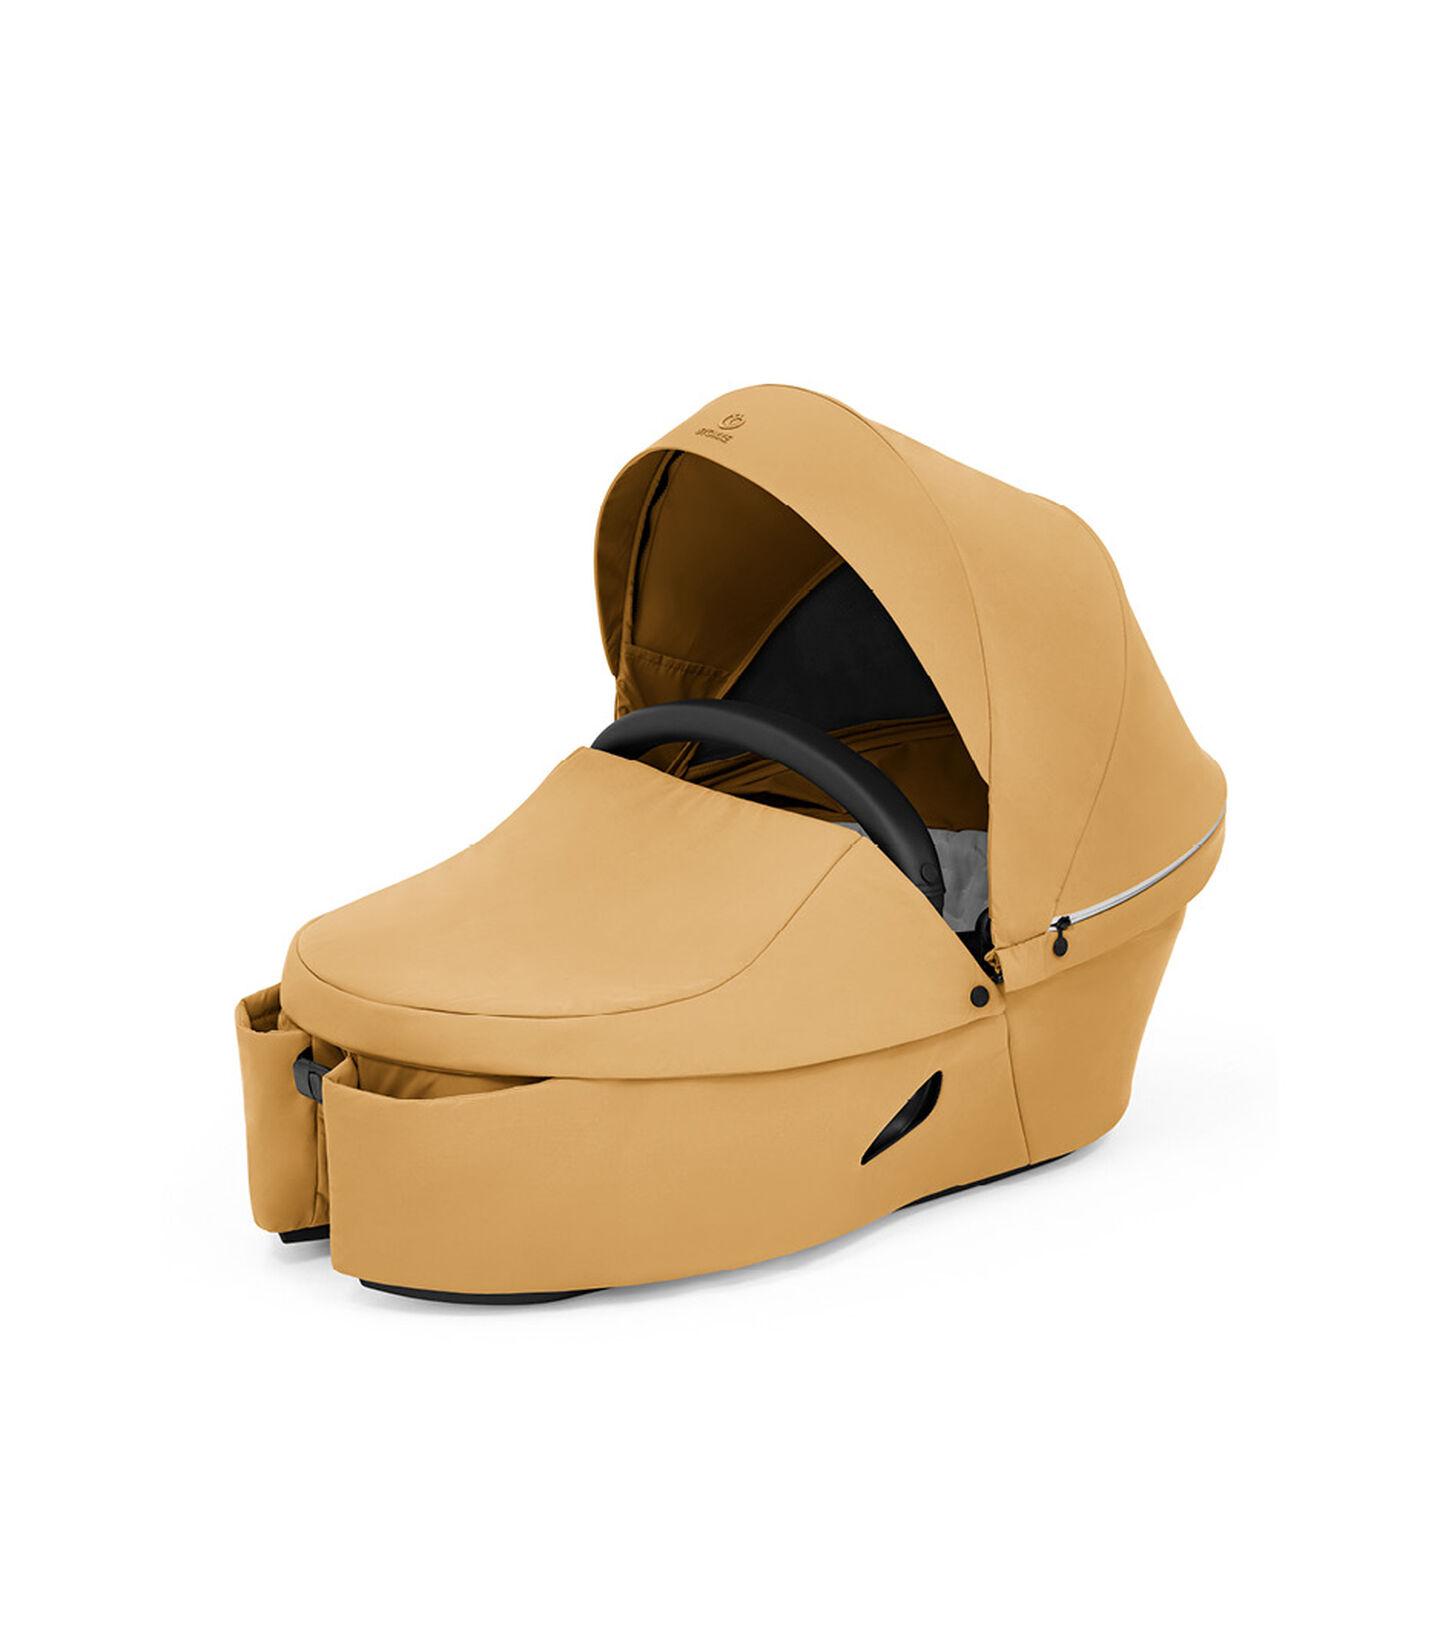 Stokke® Xplory® X-liggdel Golden Yellow, Golden Yellow, mainview view 6